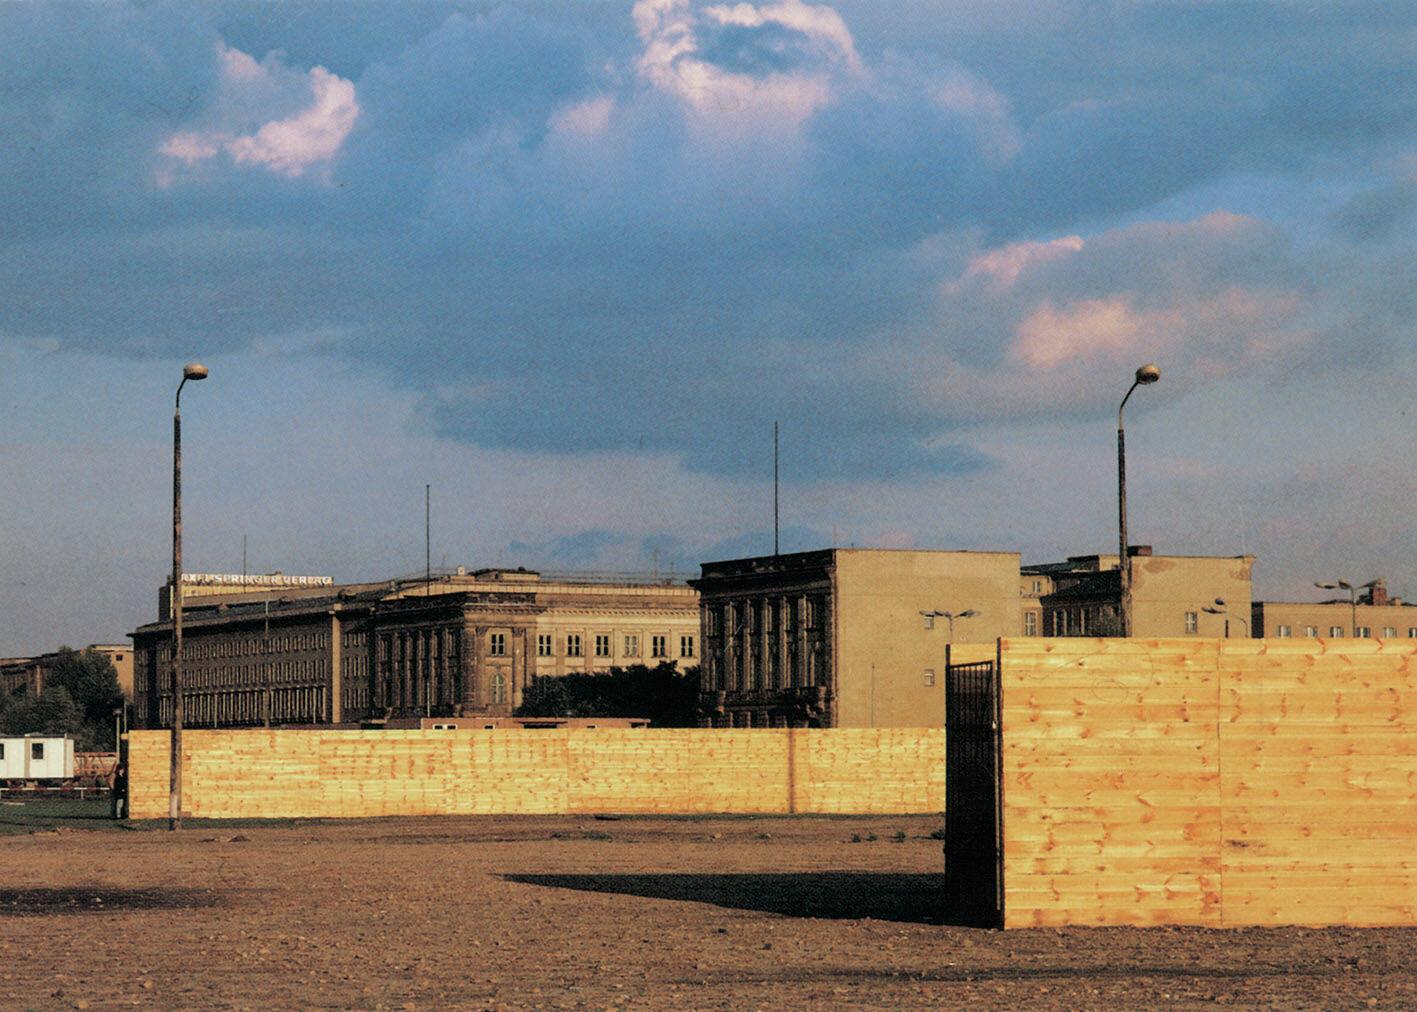 View-of-installation-Potsdamer-Platz-Berlin-1990-Photo-by-Michael-Harms.jpg